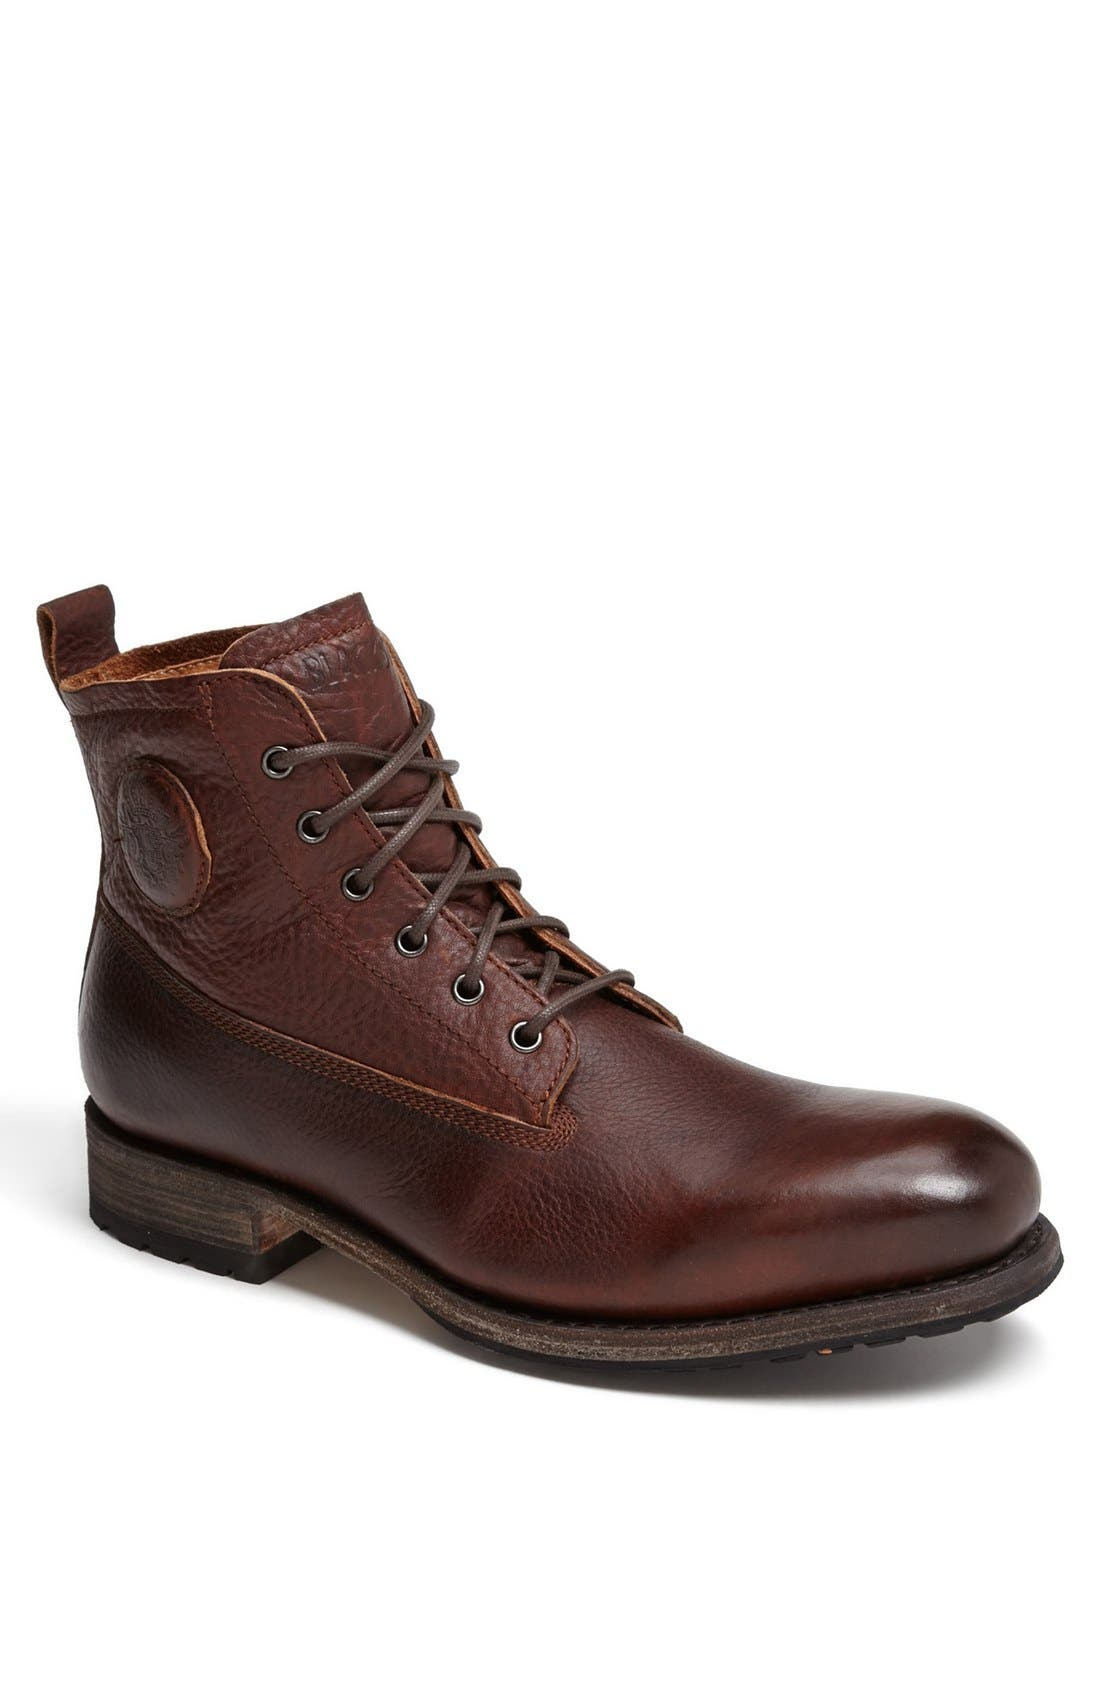 Alternate Image 1 Selected - Blackstone 'GM 09' Plain Toe Boot (Men)